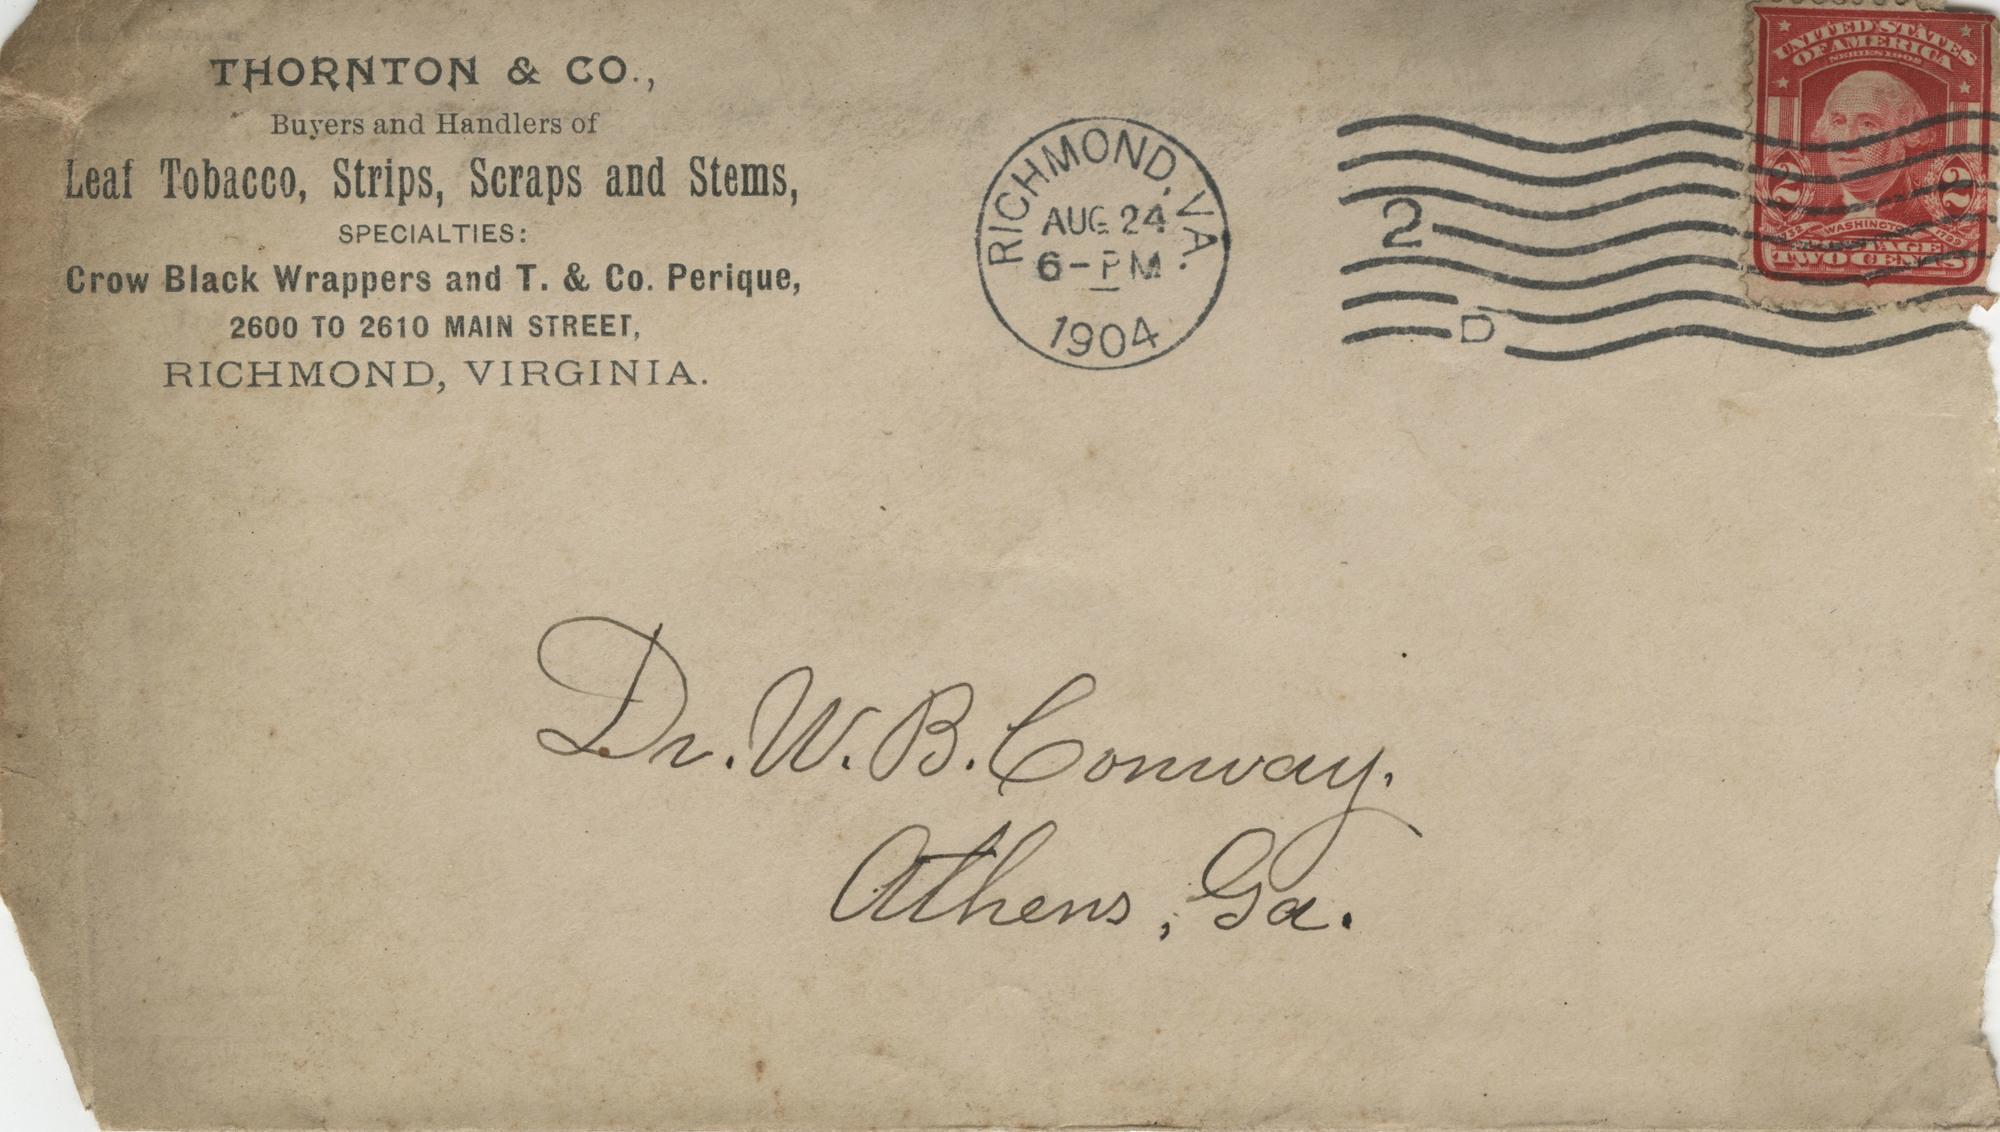 http://spec.lib.vt.edu/pickup/Omeka_upload/Ms2012-039_ConwayCatlett_F5_Letter_1904_0824_enva.jpg